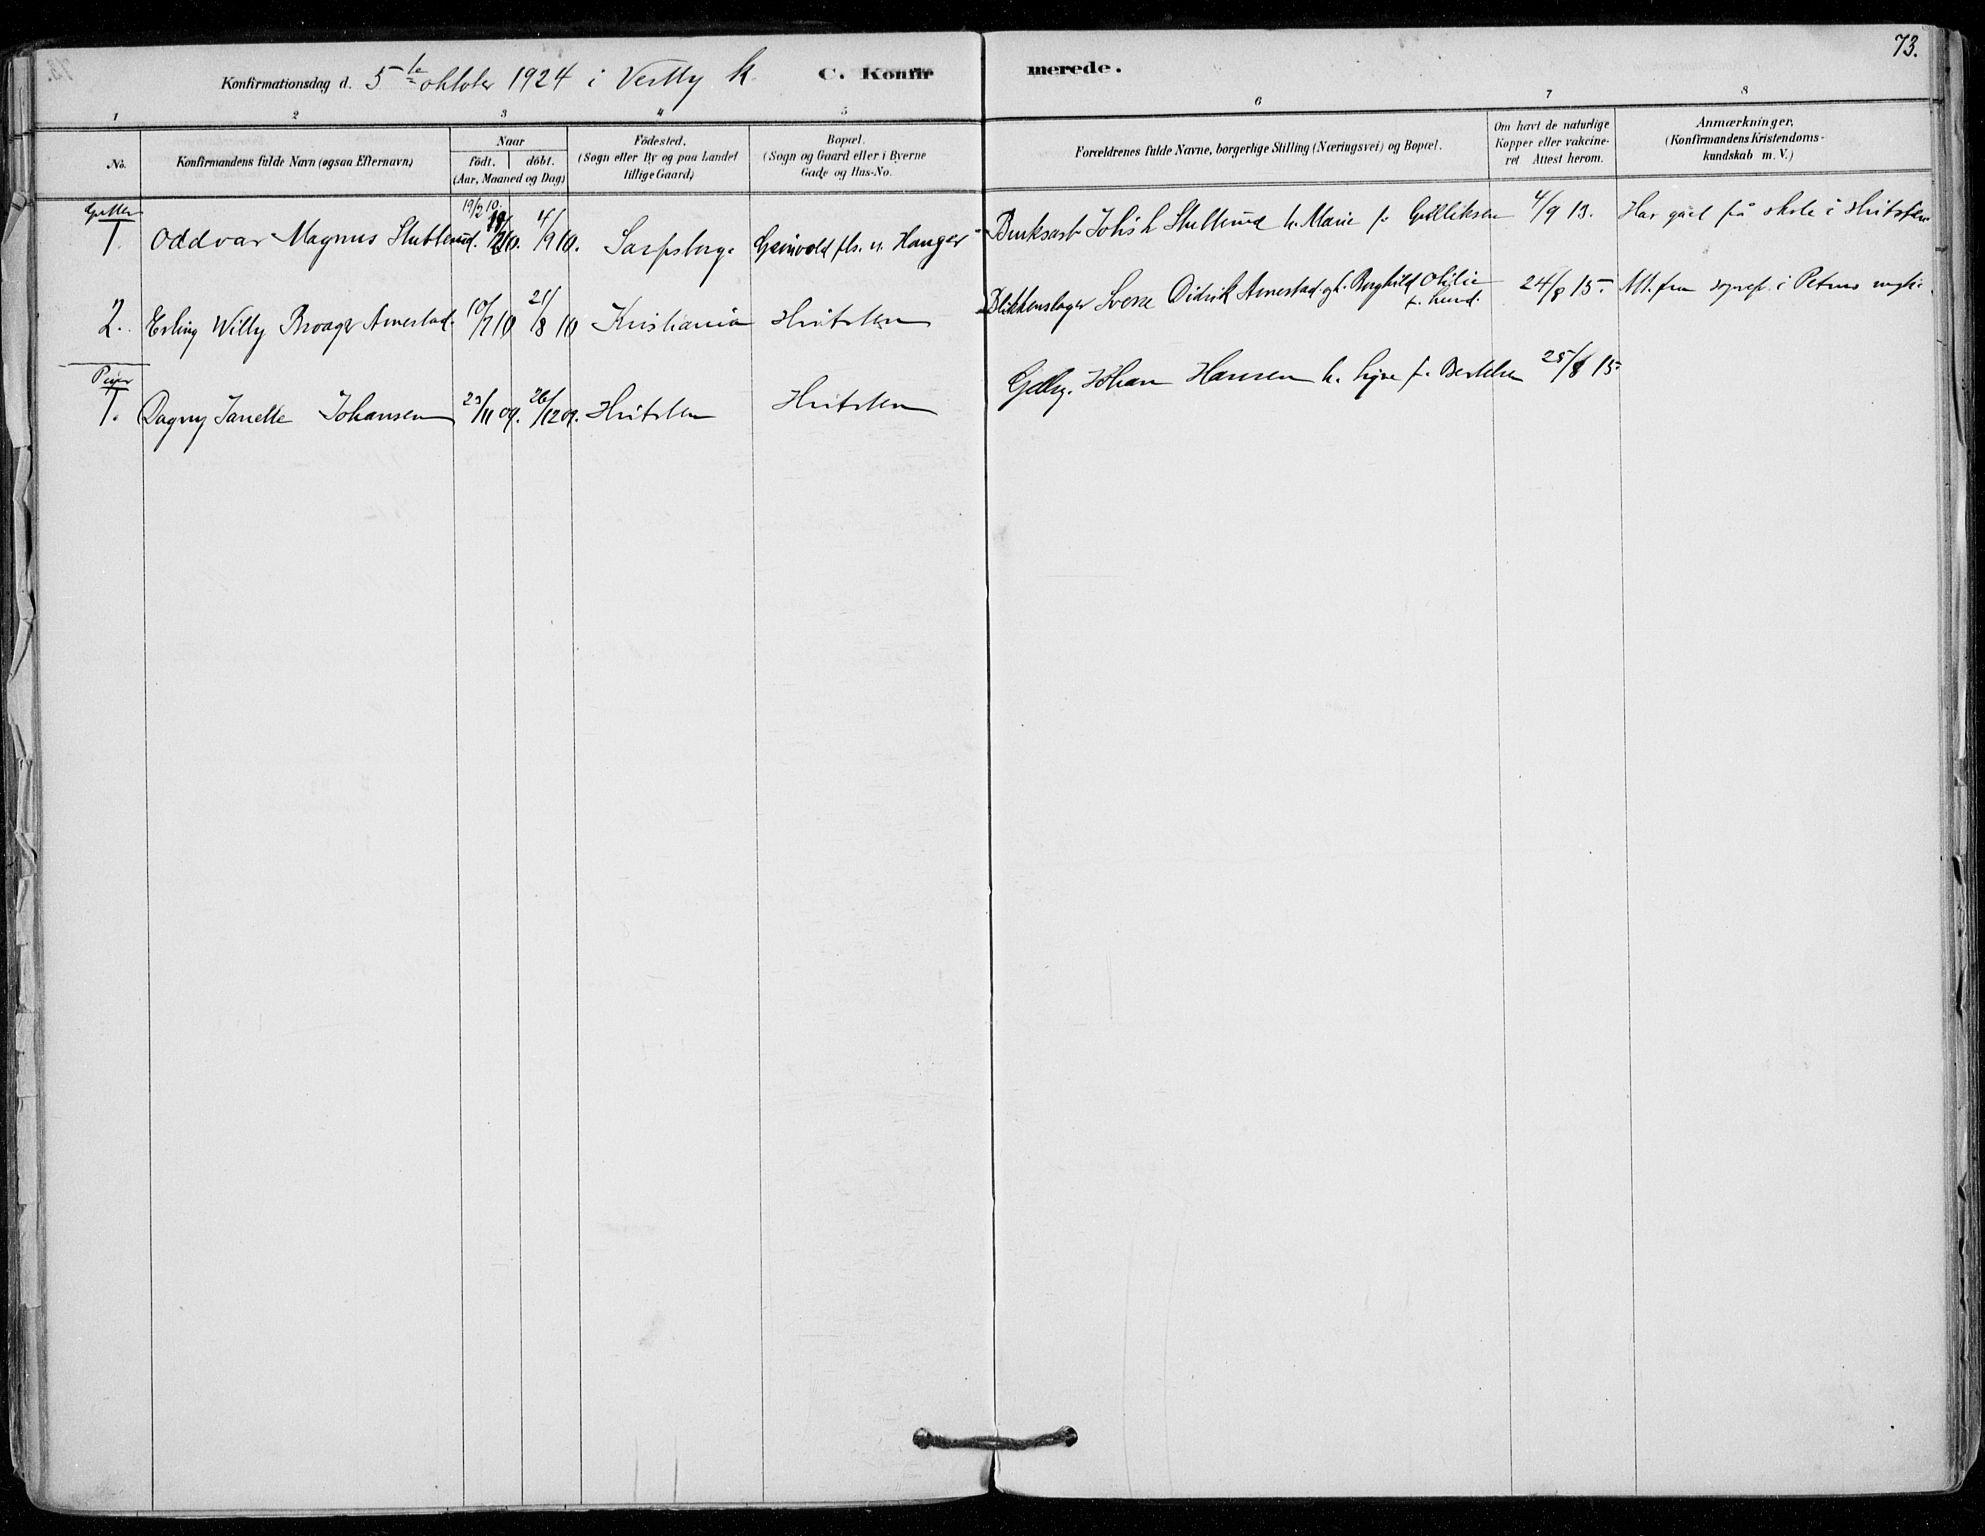 SAO, Vestby prestekontor Kirkebøker, F/Fd/L0001: Ministerialbok nr. IV 1, 1878-1945, s. 73